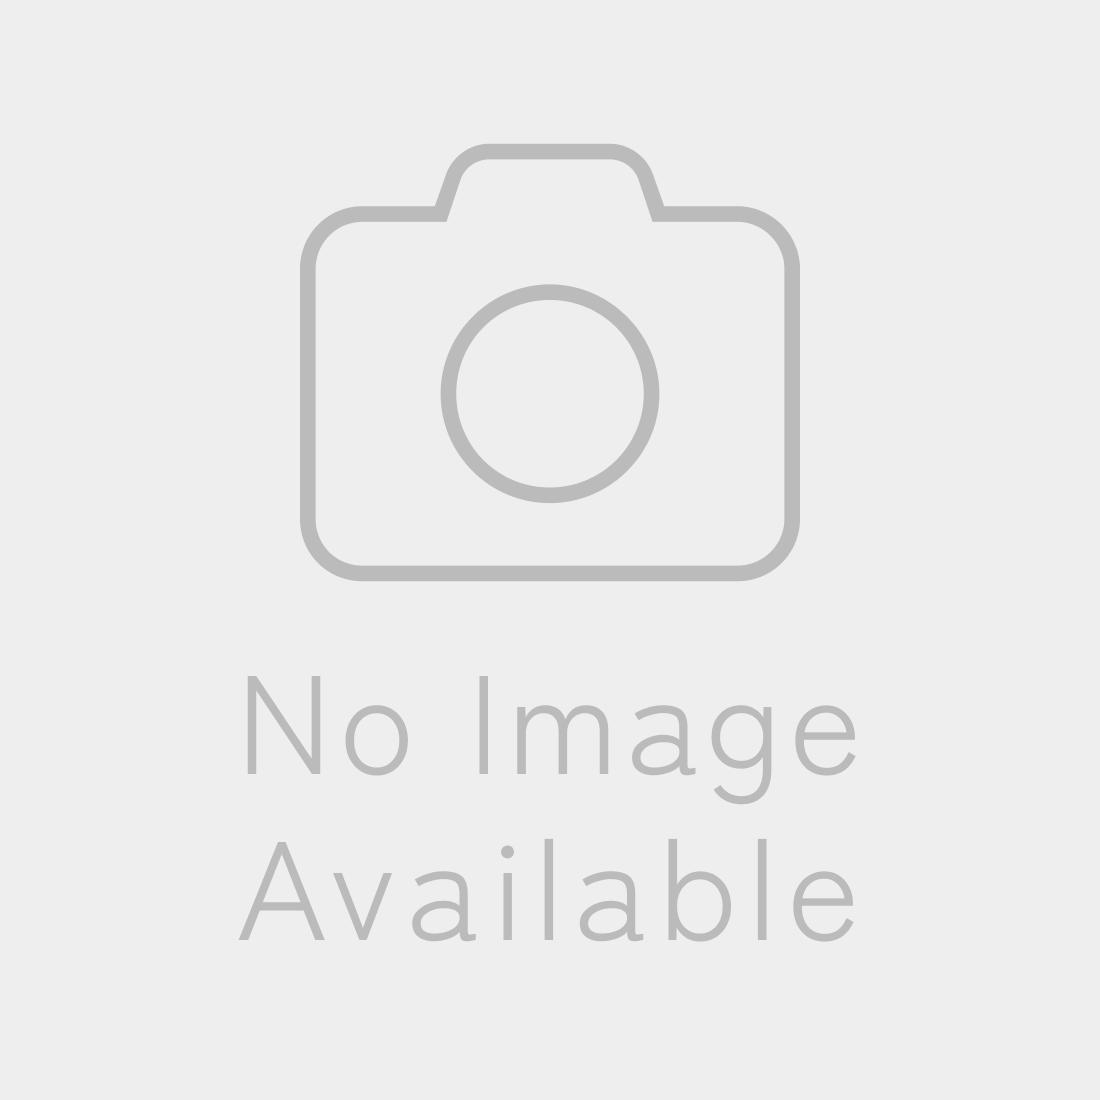 ADONIS 2F 2.15 GALLON